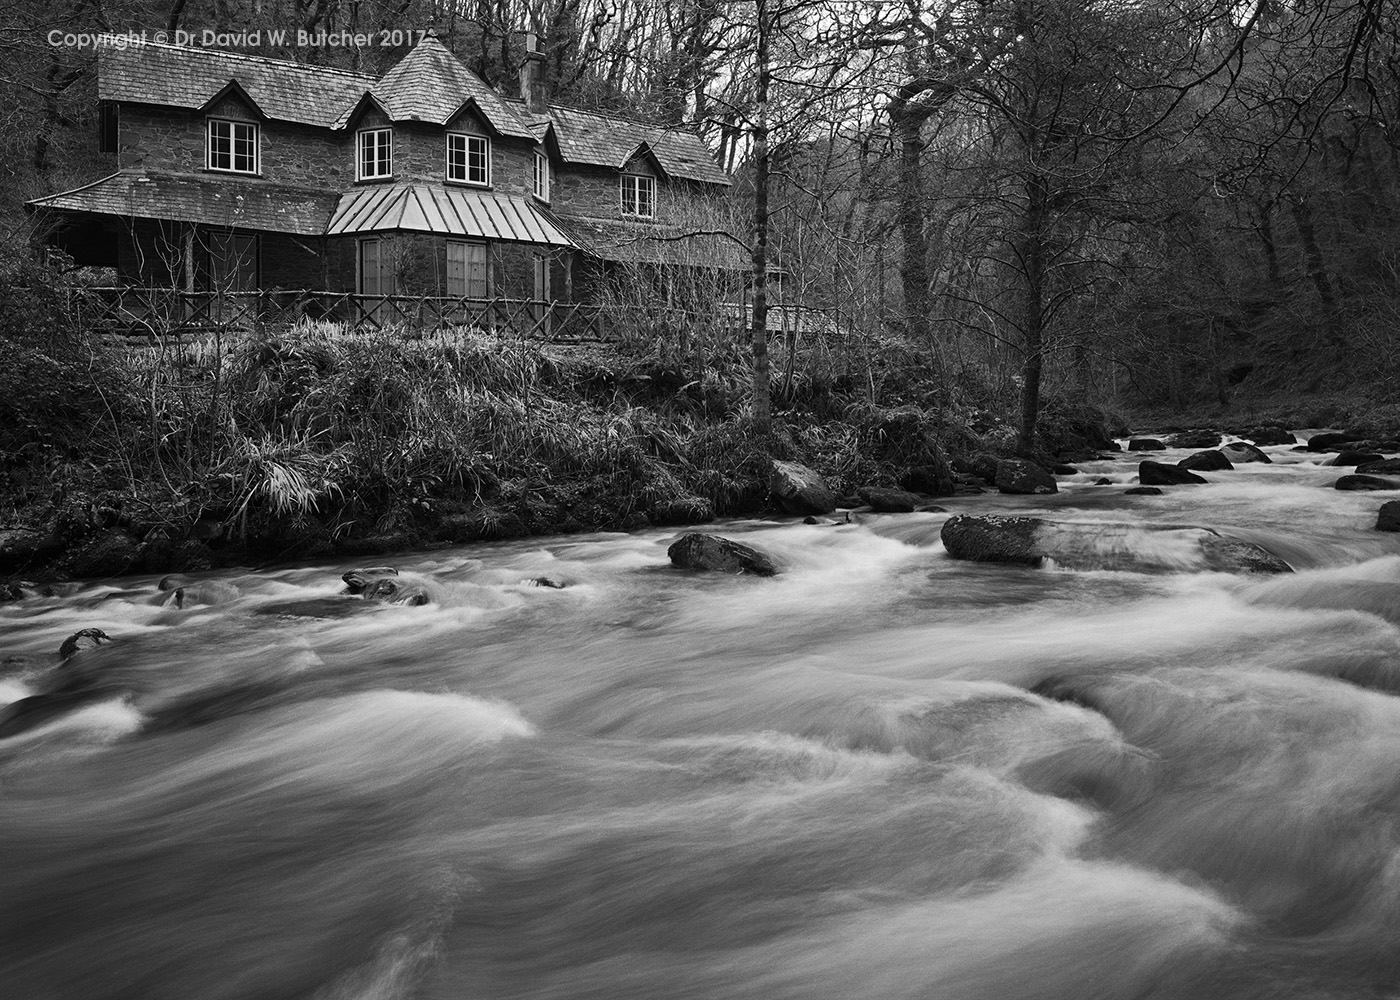 Watersmeet House and East Lyn River, Exmoor, Devon, England